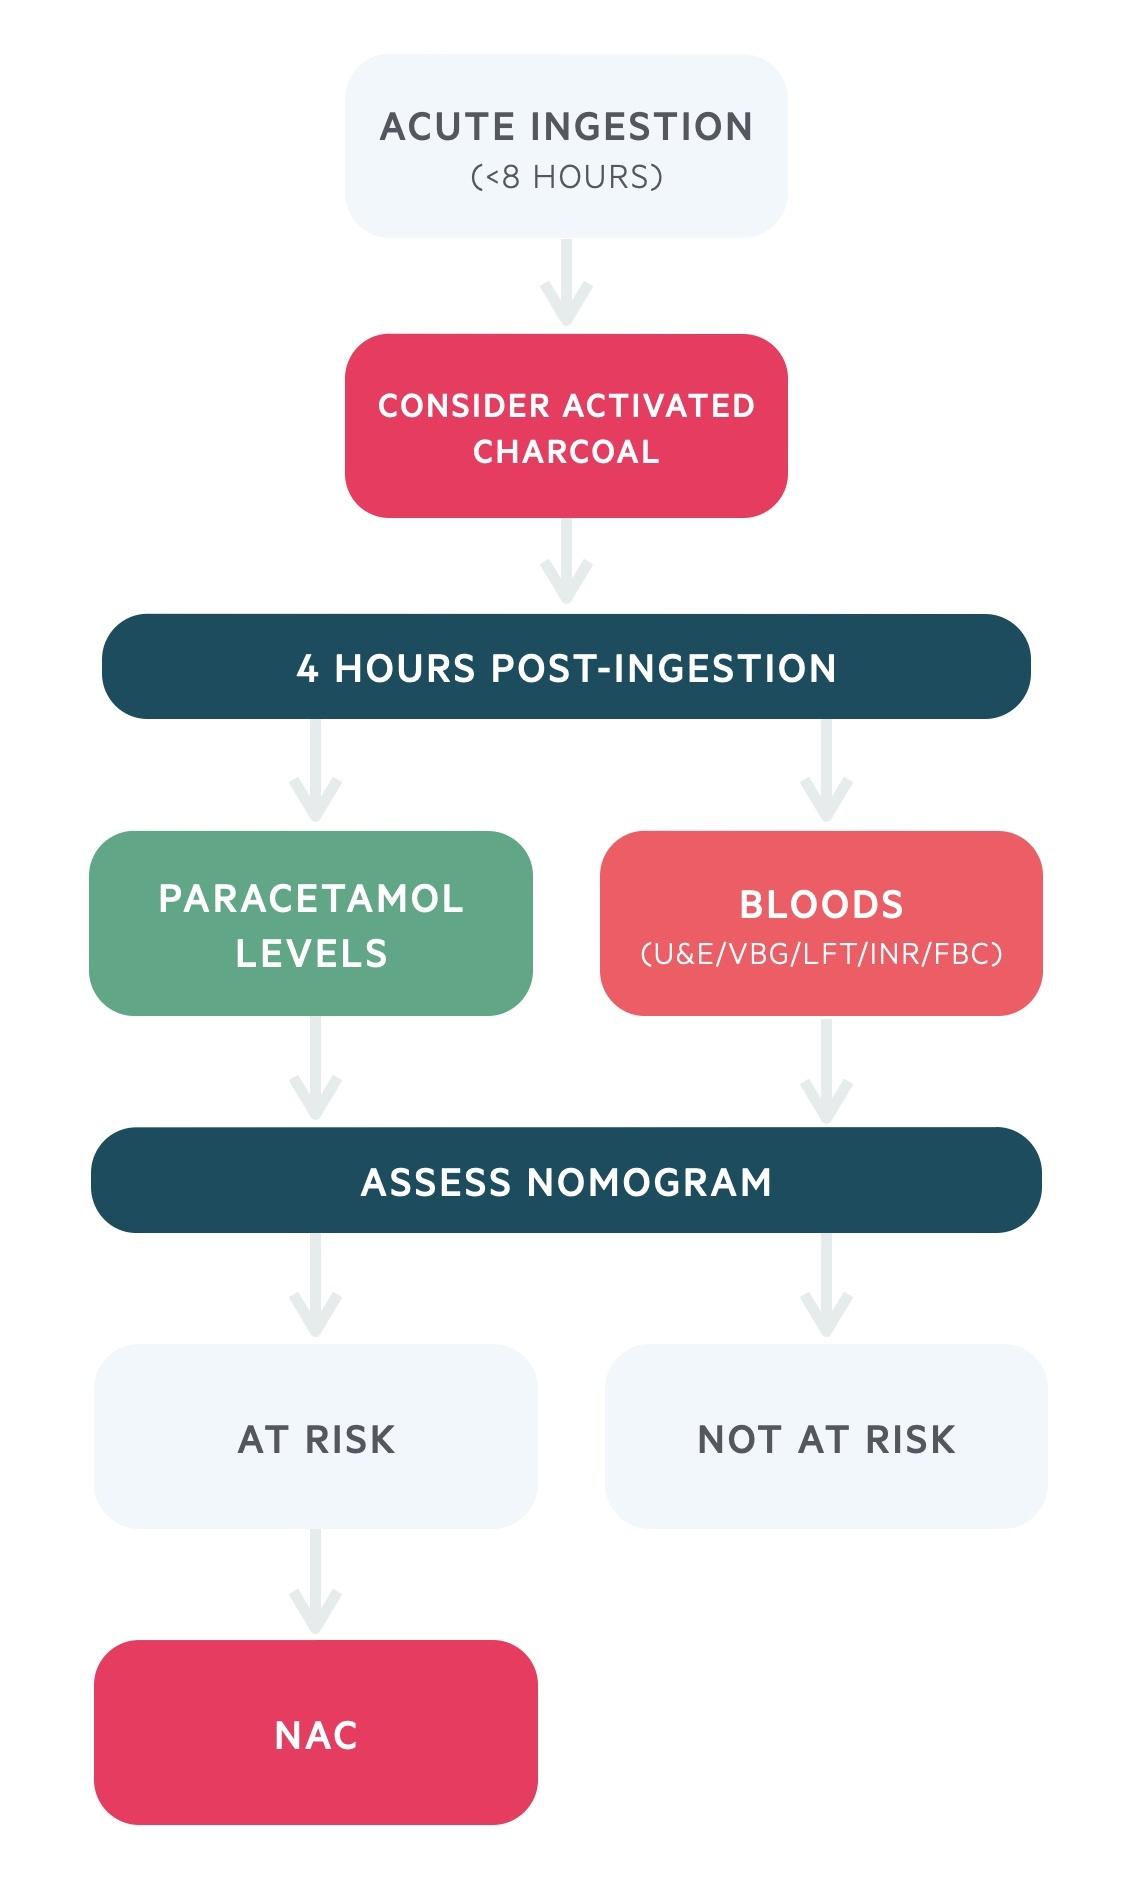 Acute ingestion (< 8 hours) paracetamol overdose management